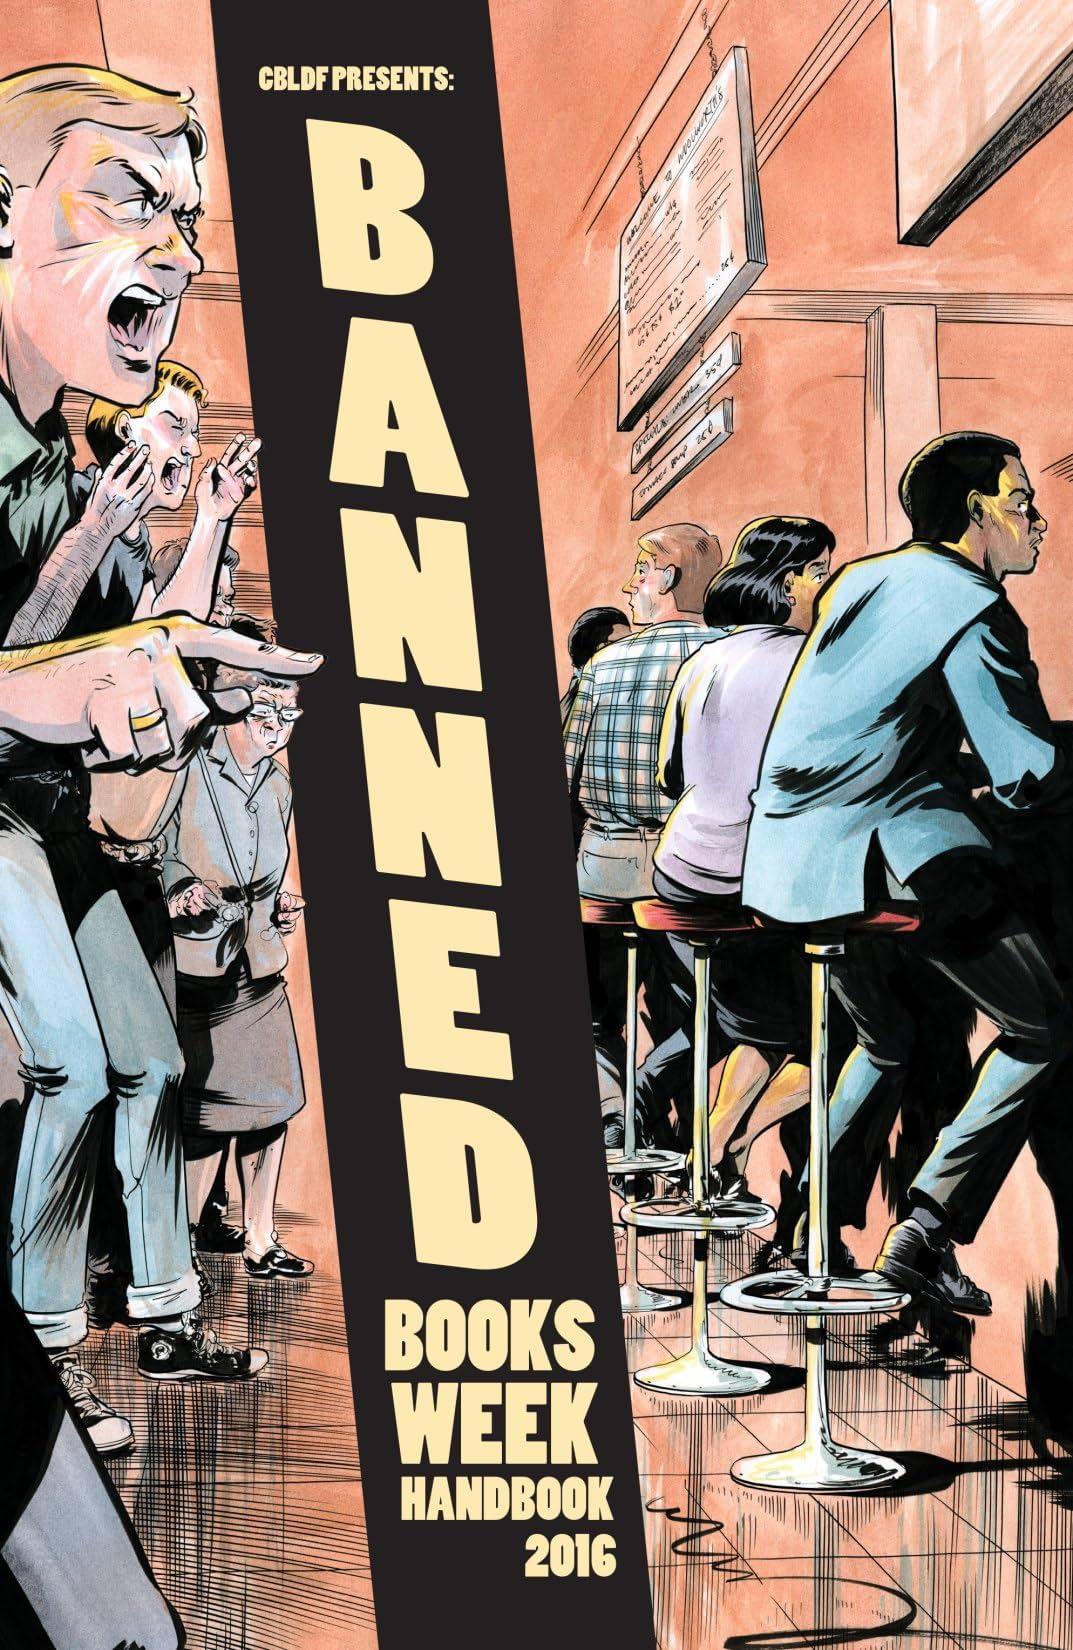 CBLDF Banned Books Week Handbook 2016